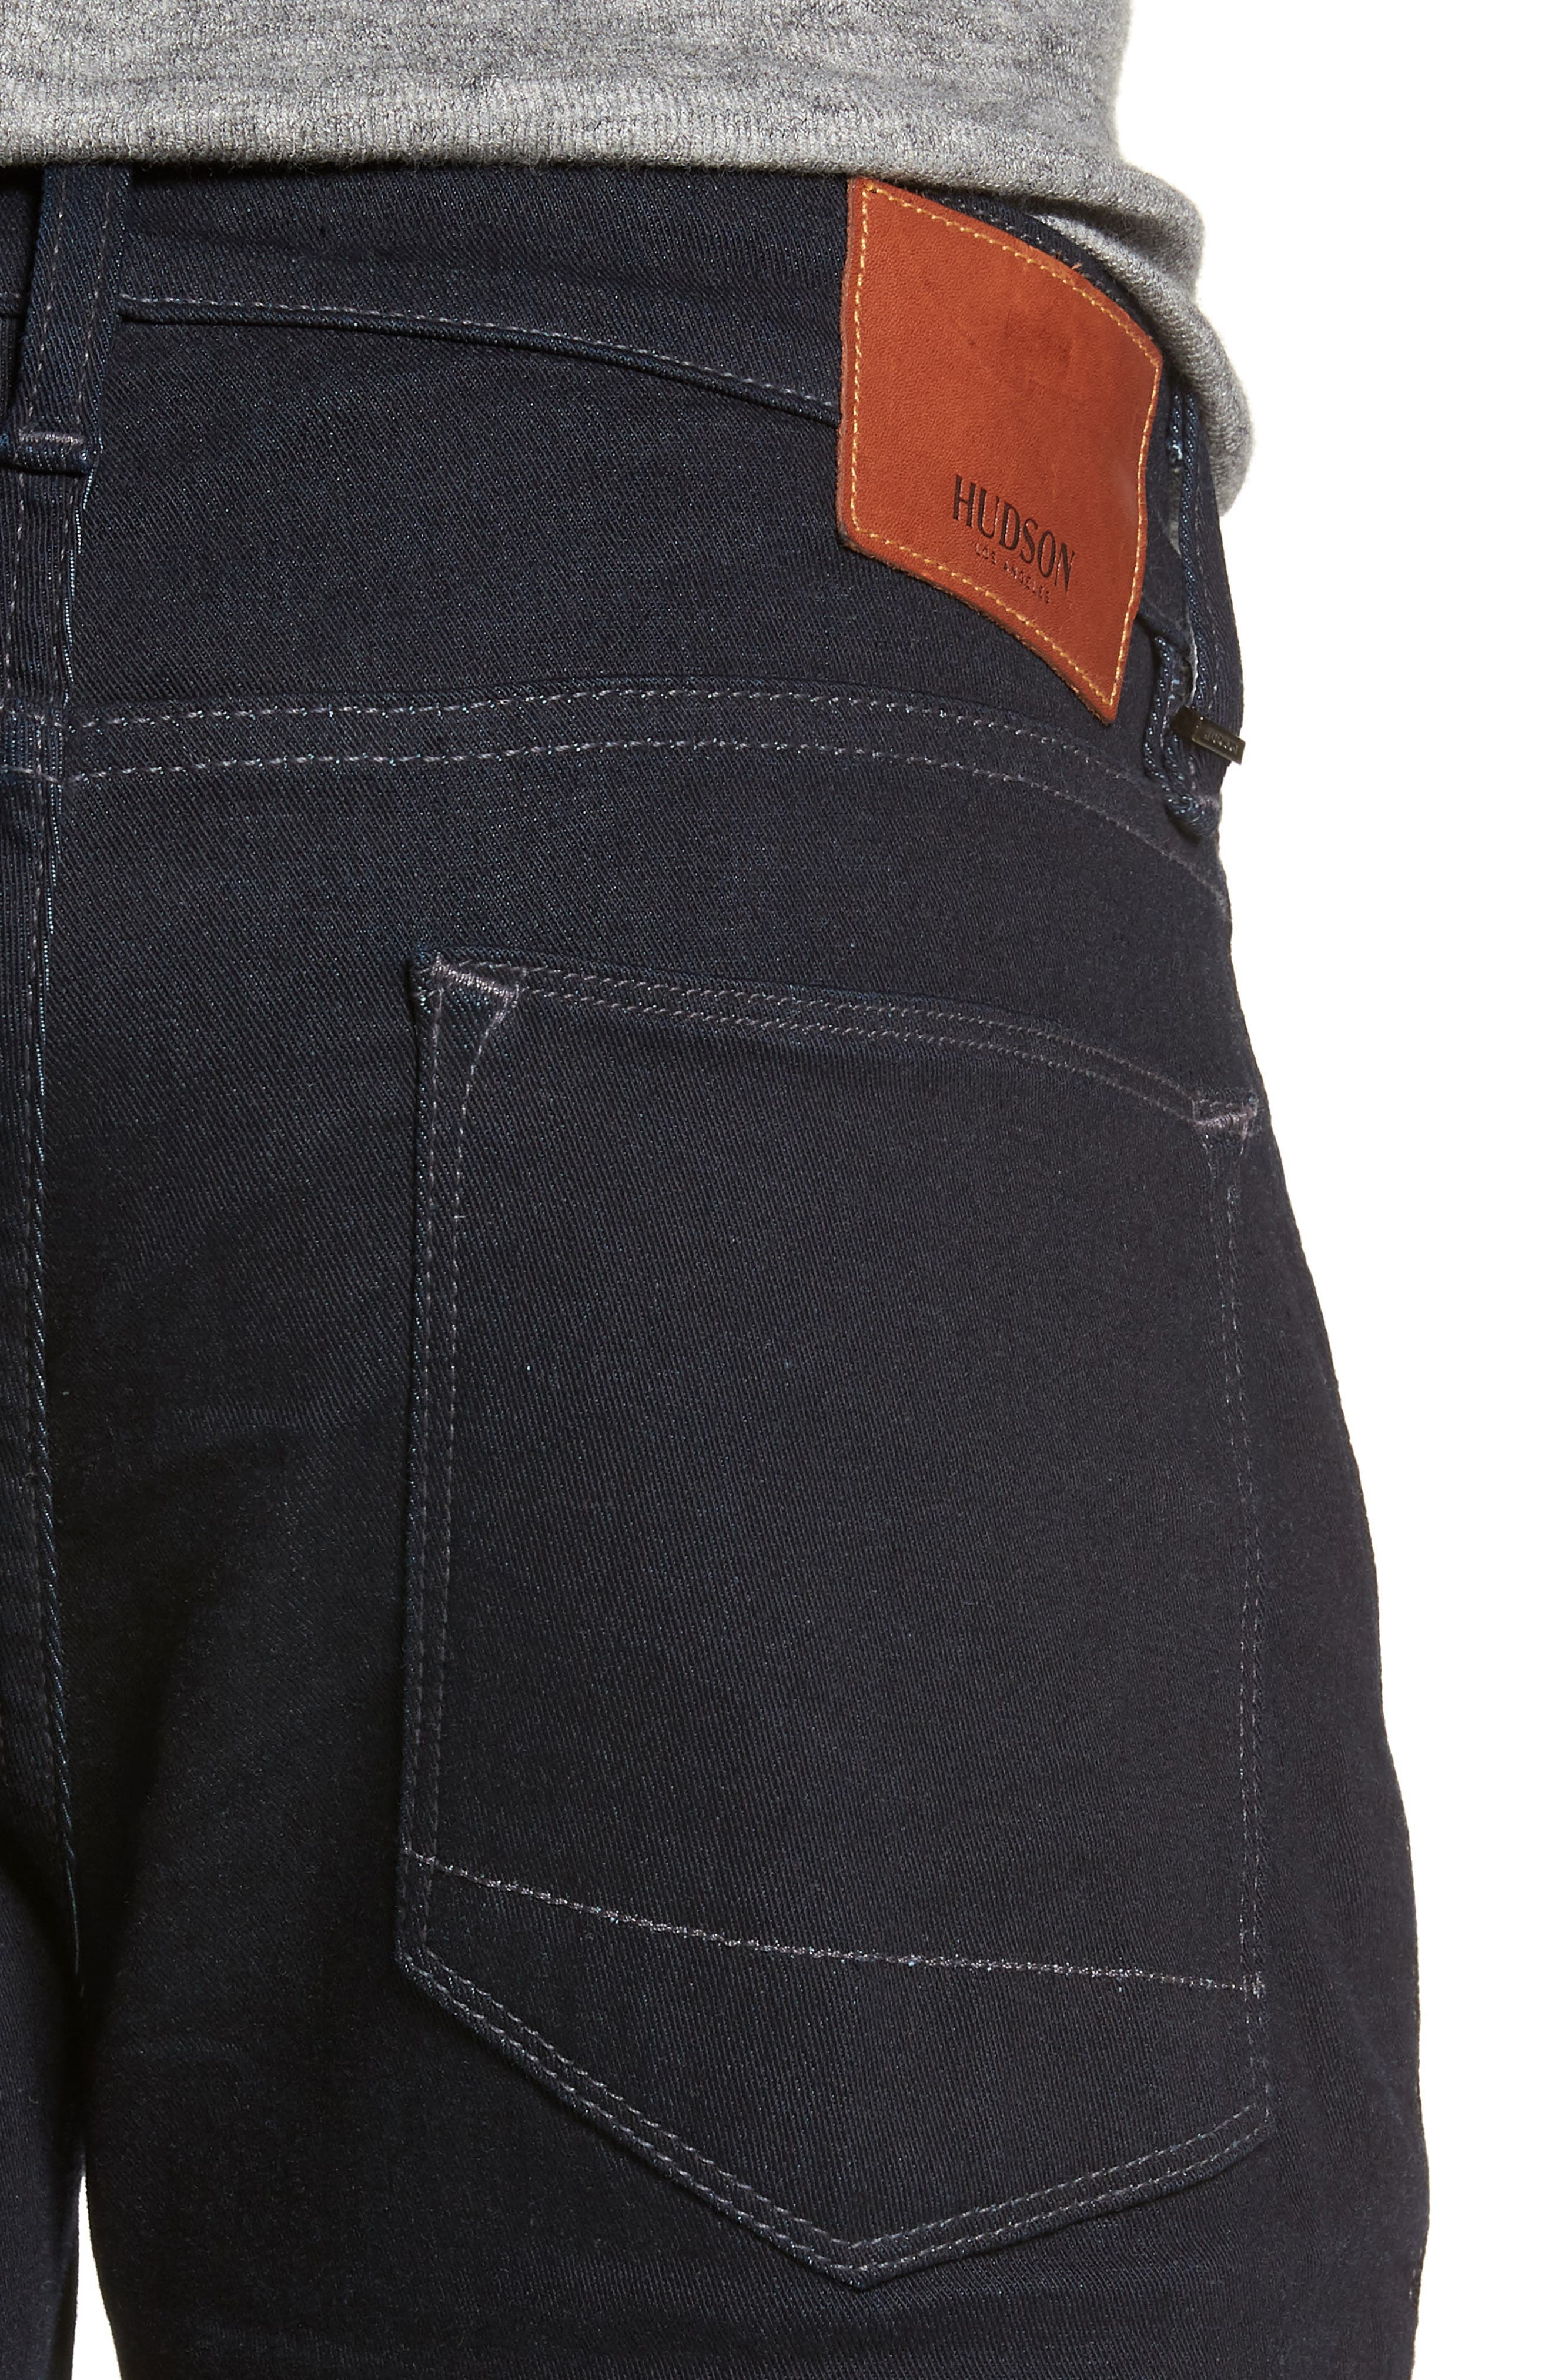 Byron Slim Straight Leg Jeans,                             Alternate thumbnail 4, color,                             TUDOR